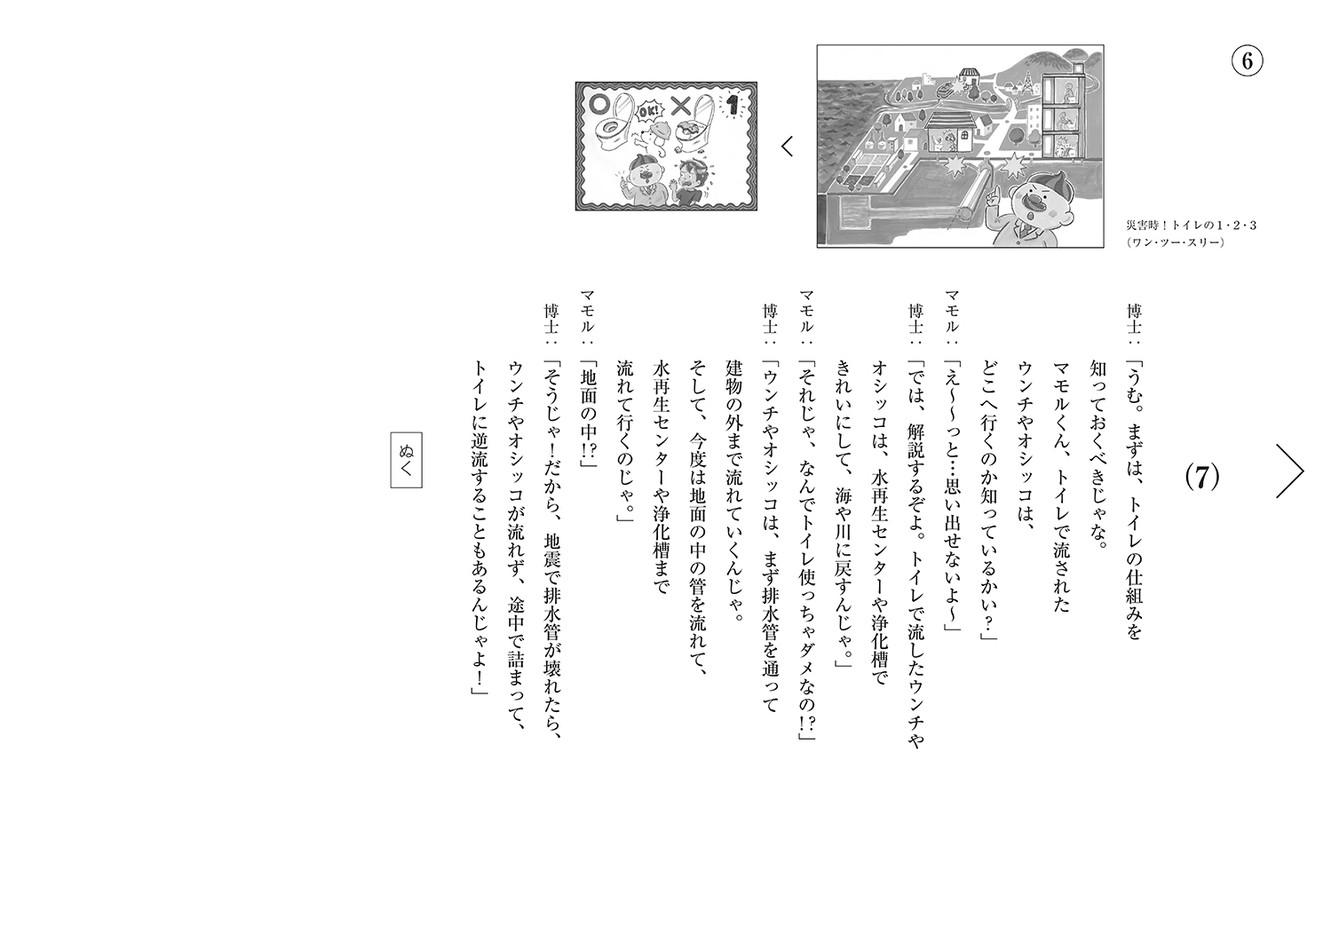 kanaweb_toiletkamishibai_014.jpg